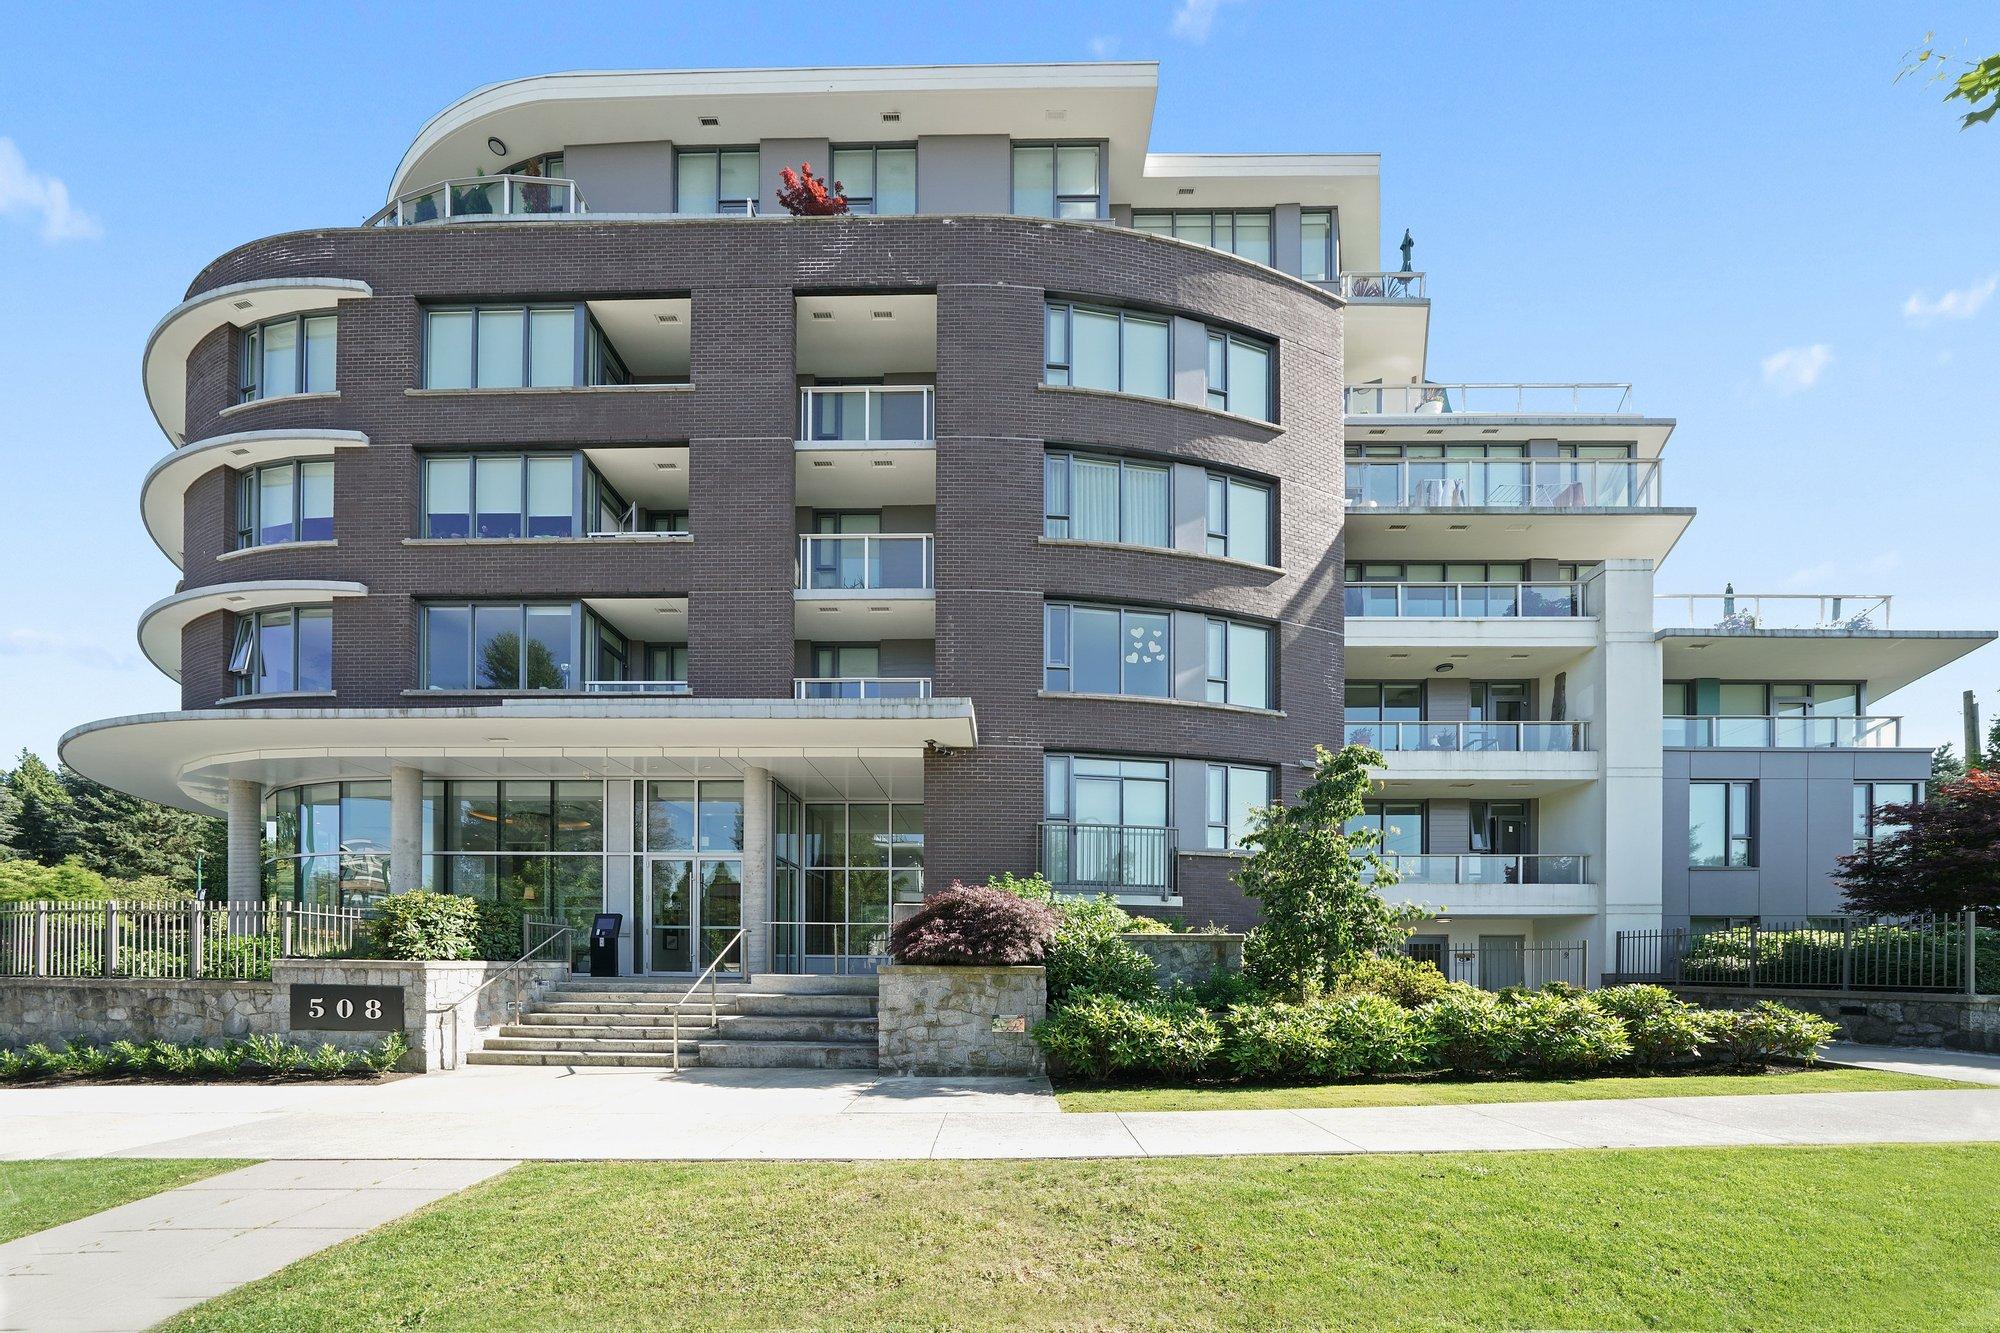 Condo in Vancouver, British Columbia, Canada 1